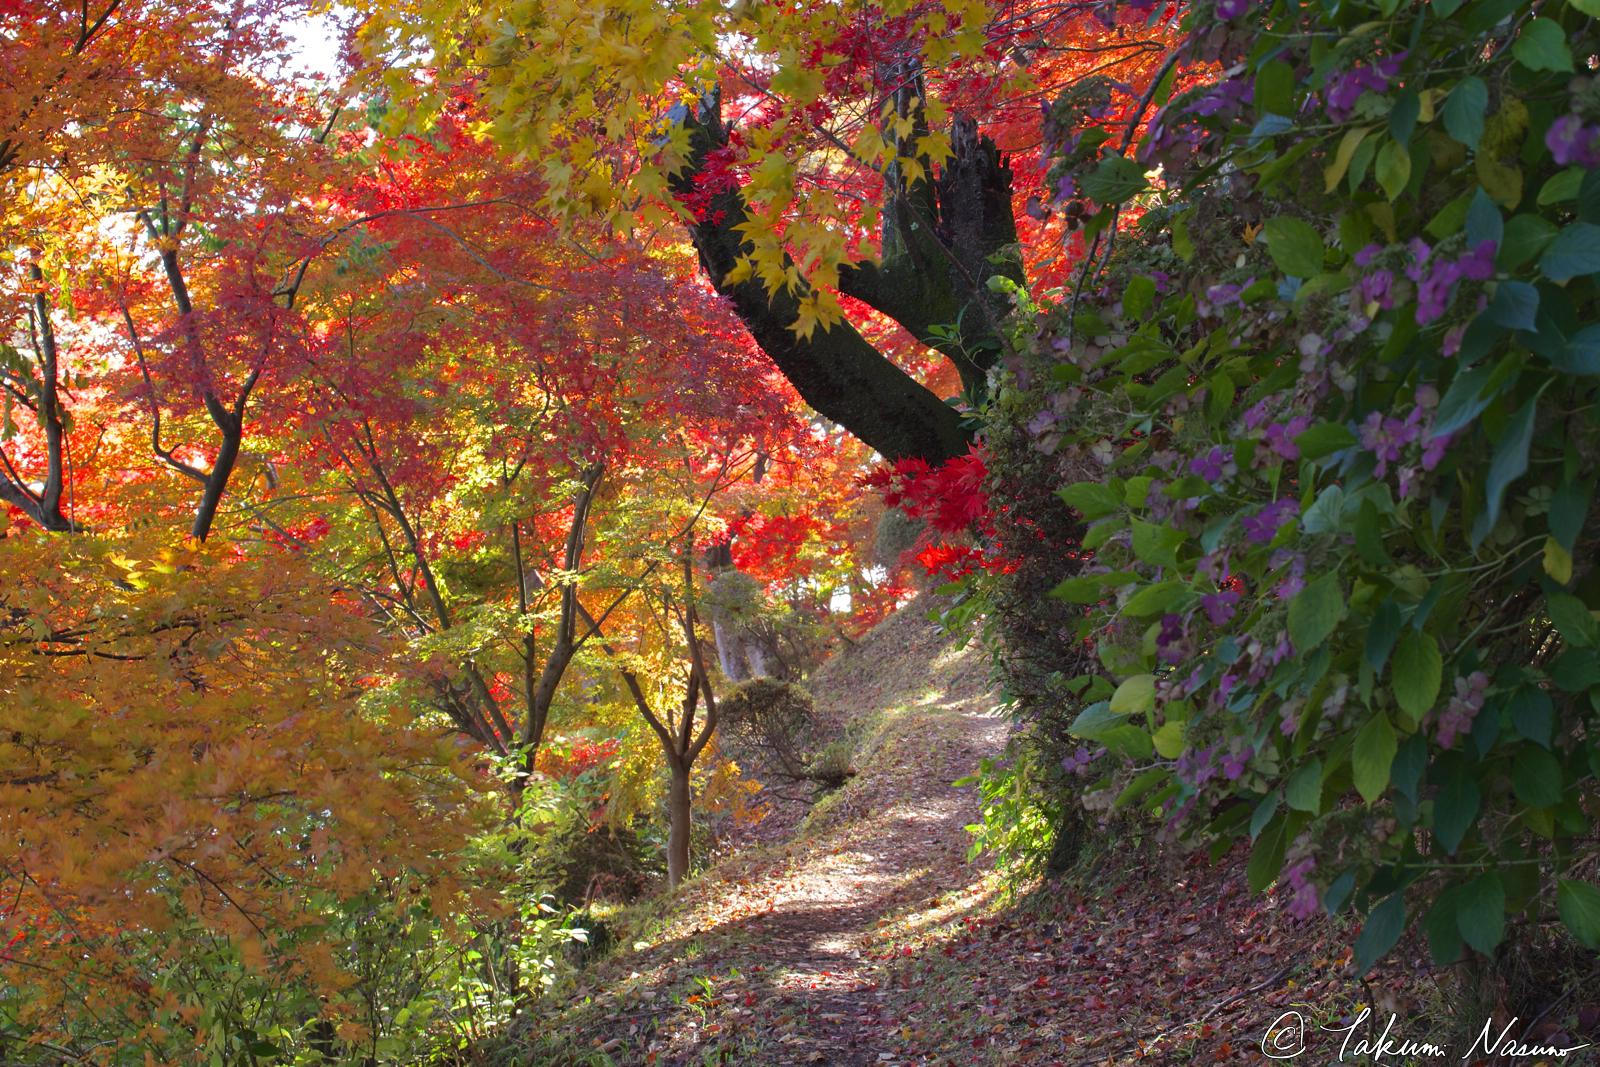 hydrangea-and-autumn-colors-of-site-of-tanagura-castle